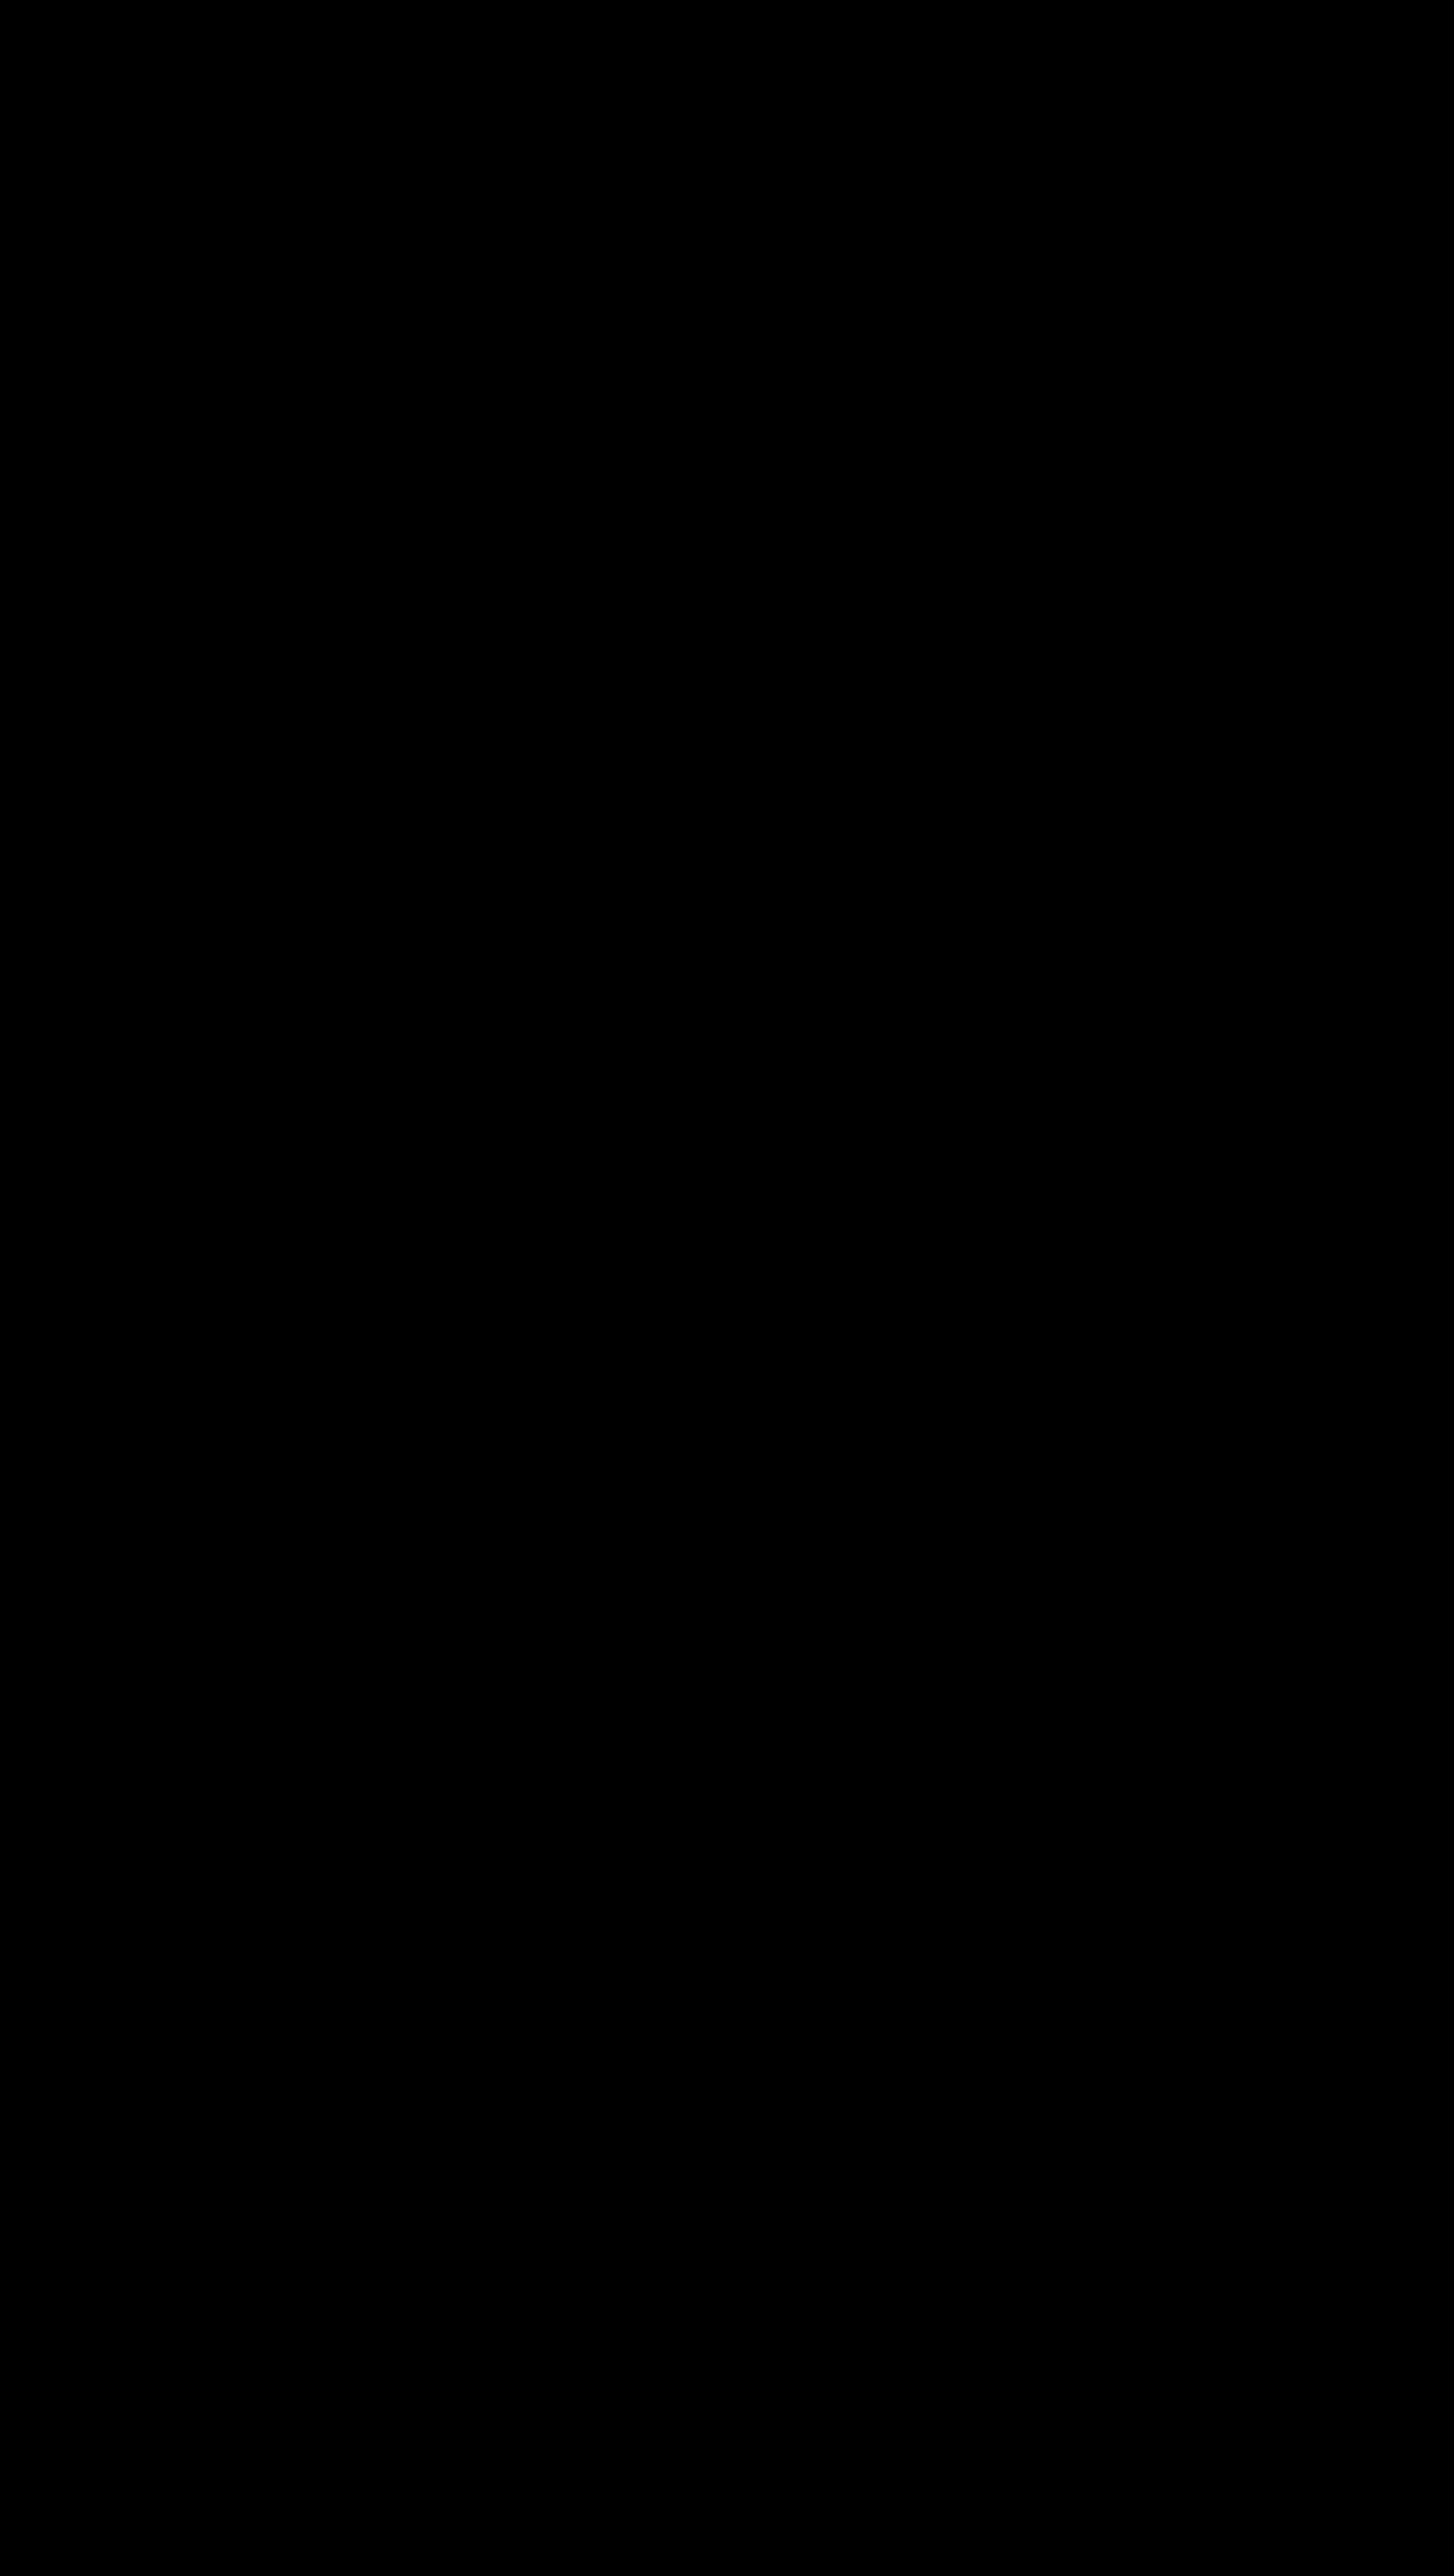 Logo 1525693405.png?ixlib=rb 1.1